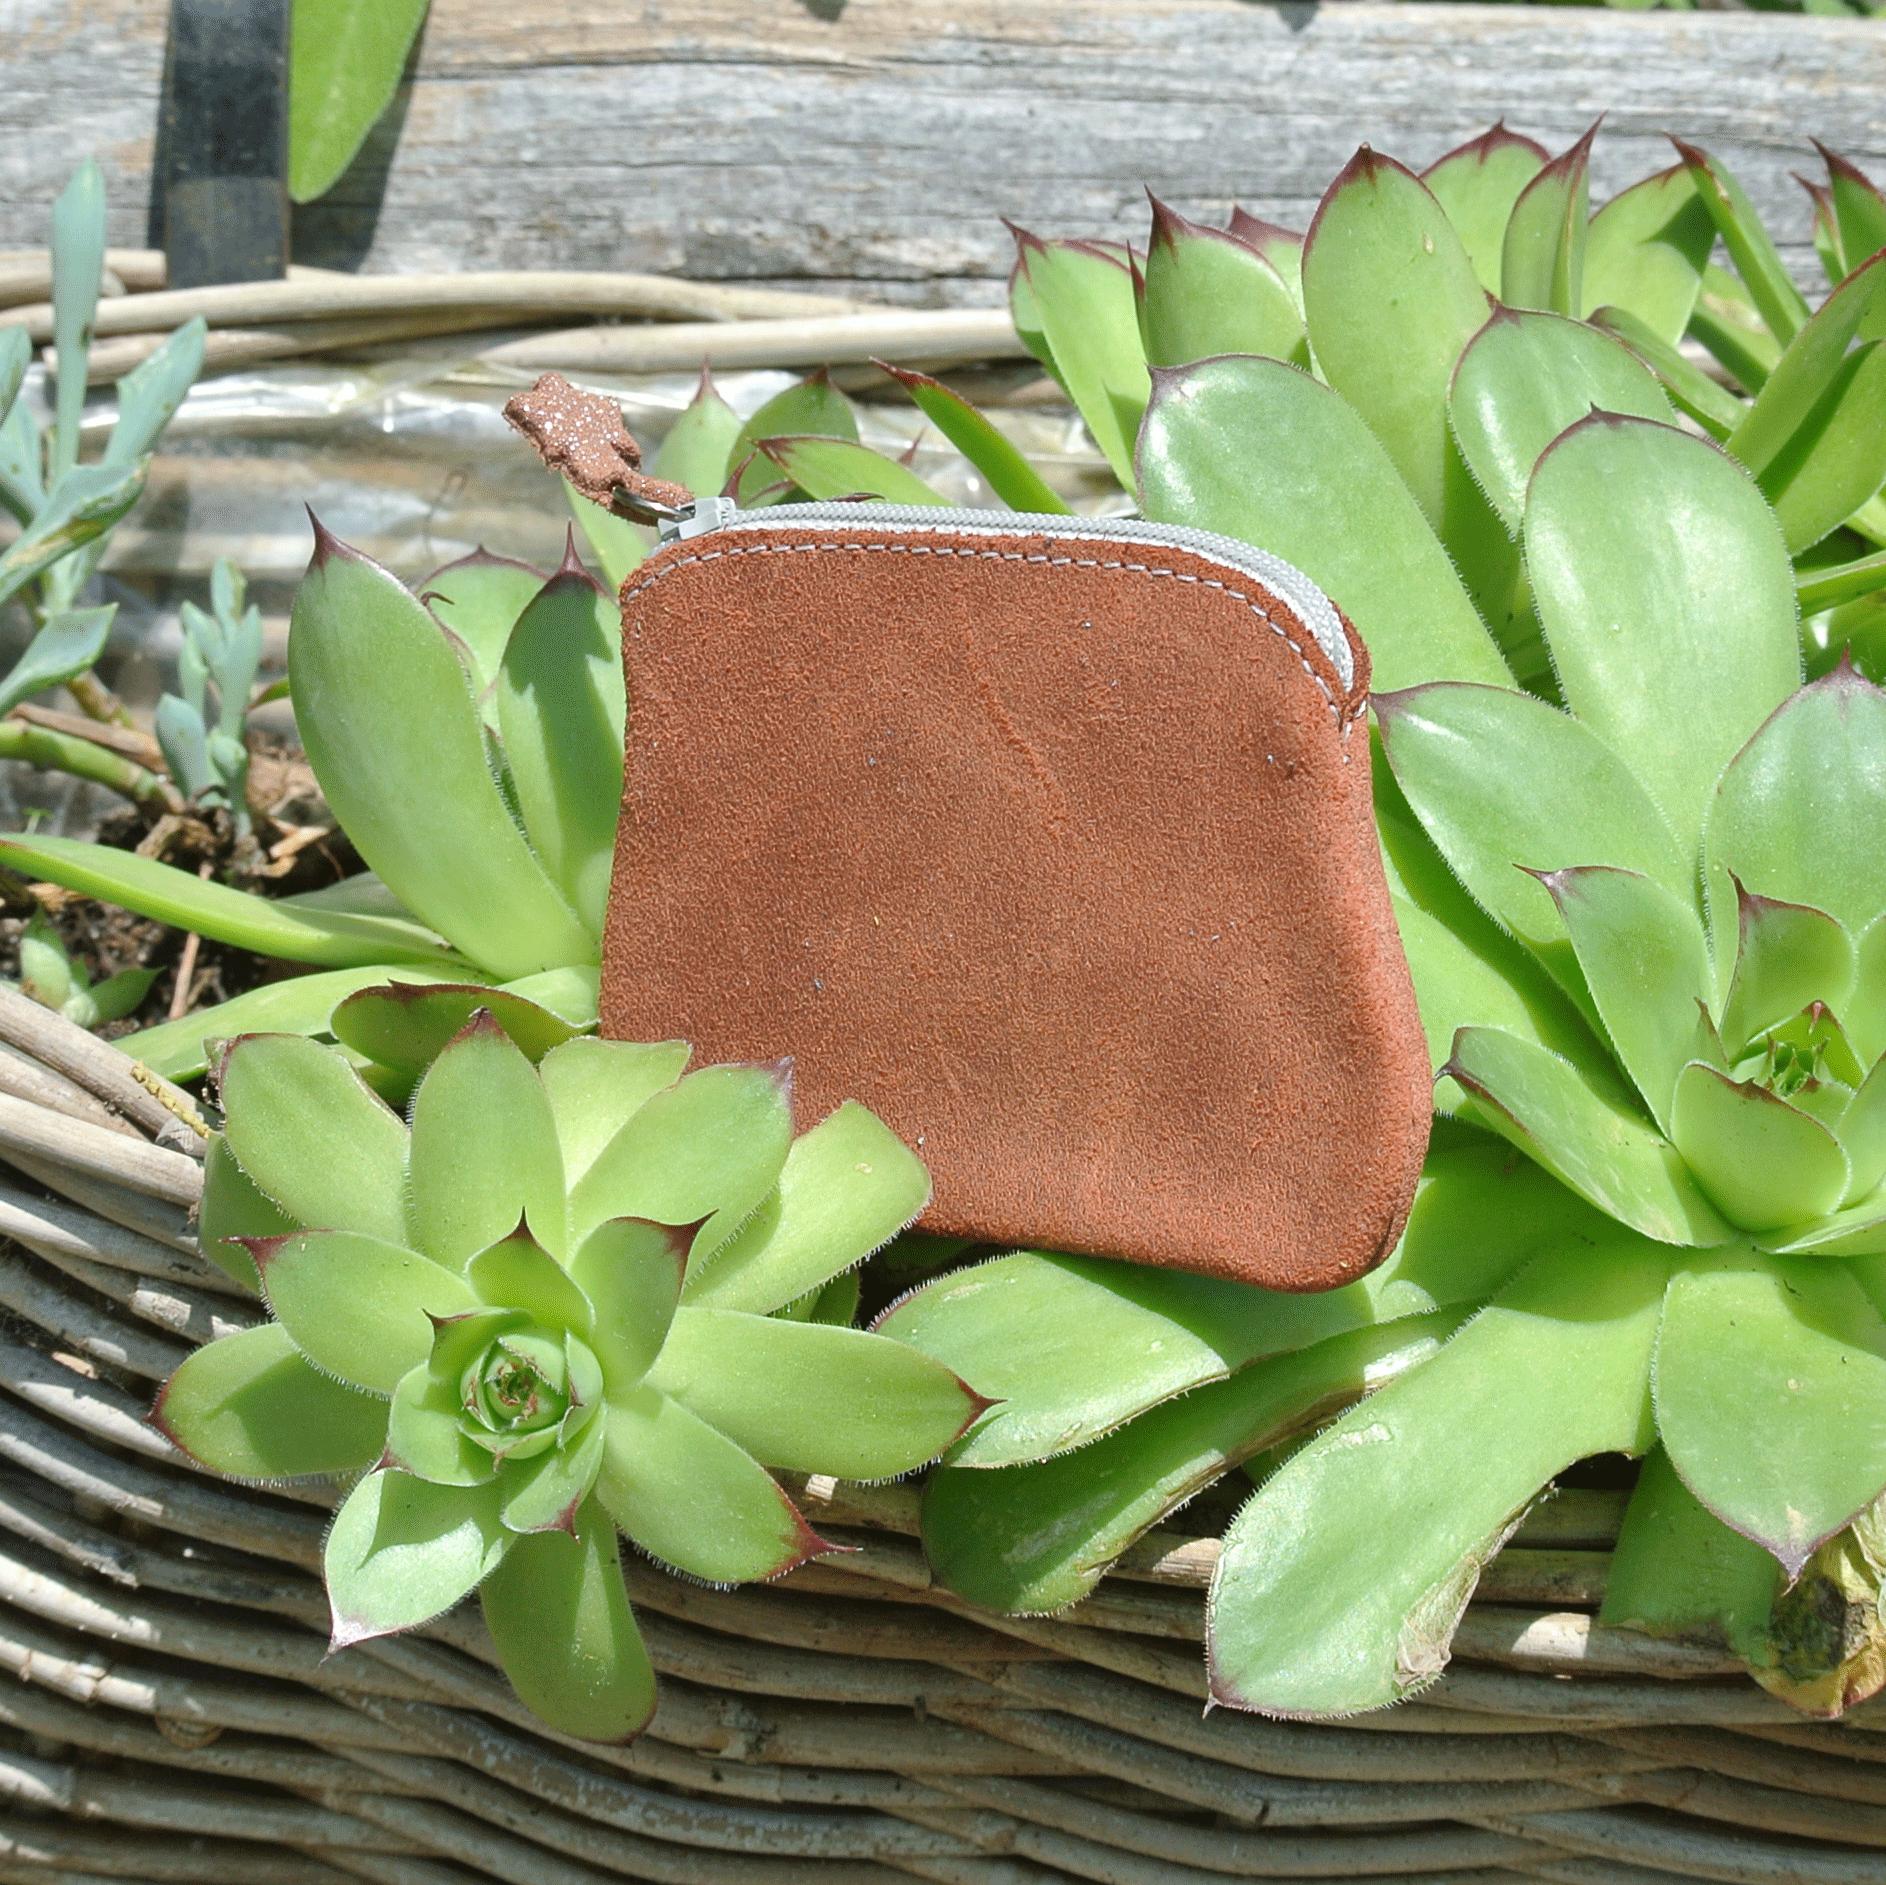 cuirs-fantaisies-la-cartabliere-fabrique-en-france-porte-monnaie-kiwi-en-cuir-retro-terracotta